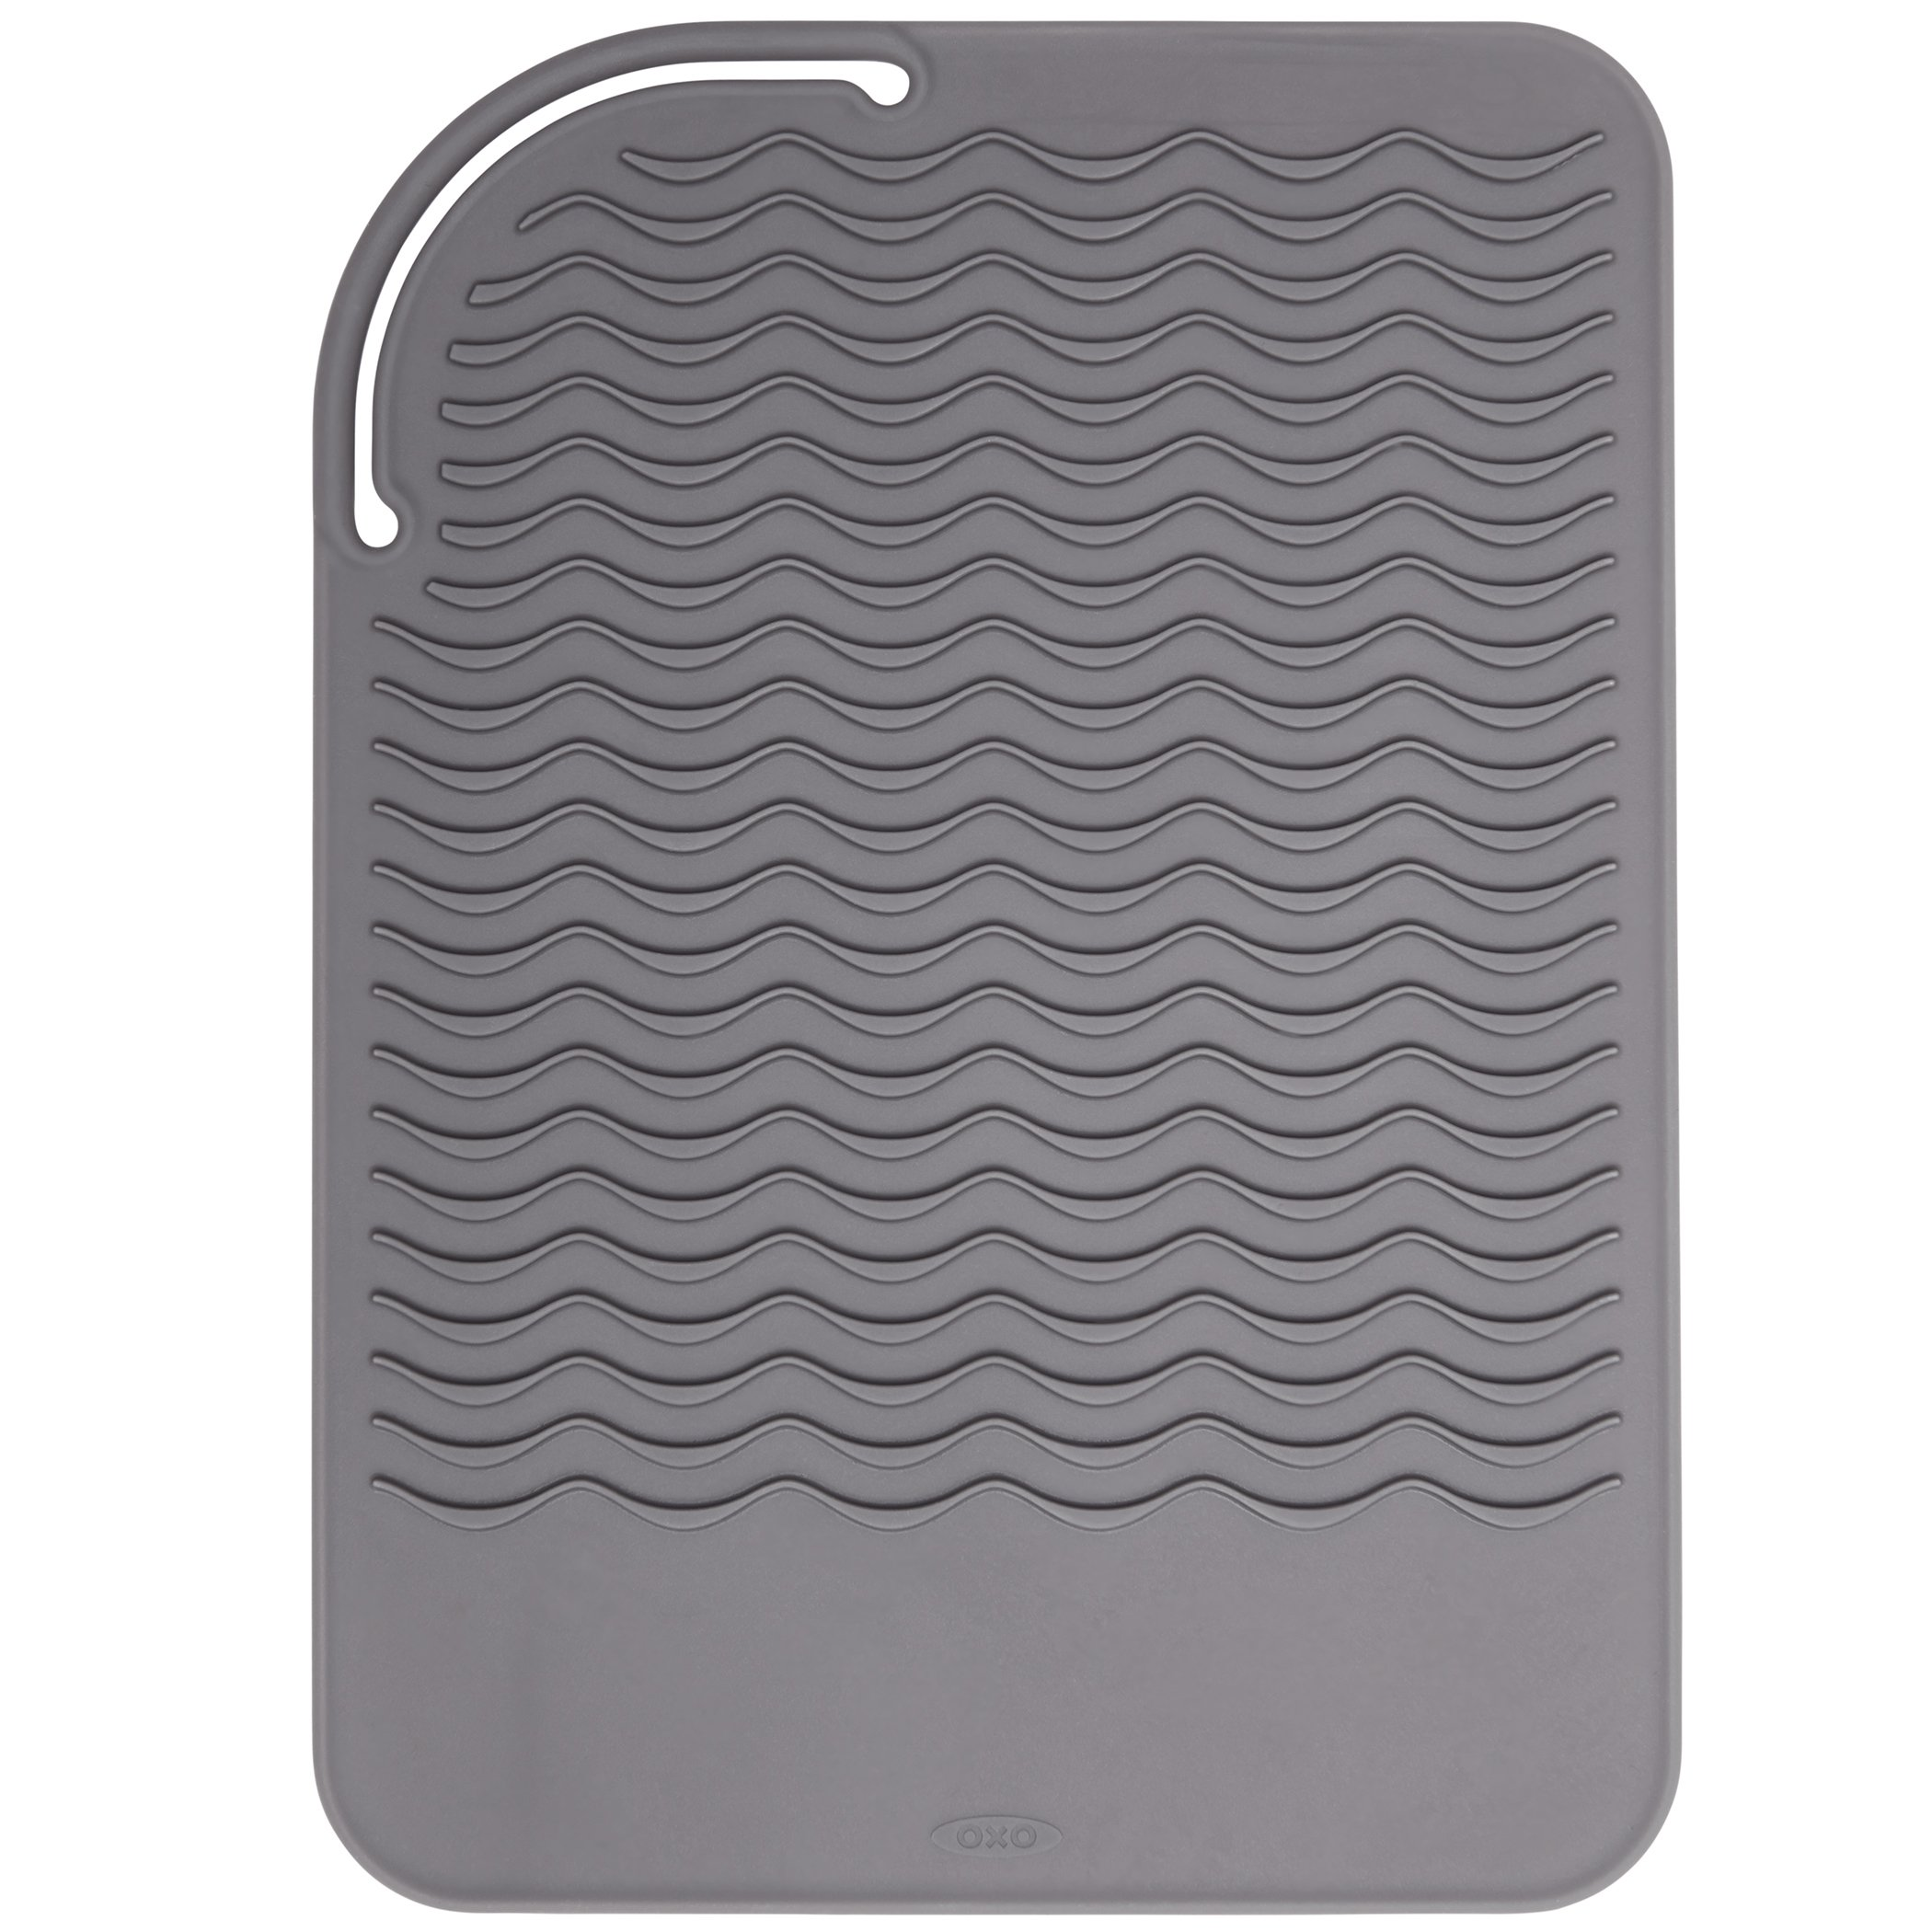 purpose mat multi pin heat trivet mats resistant ubl jar silicone opener oval